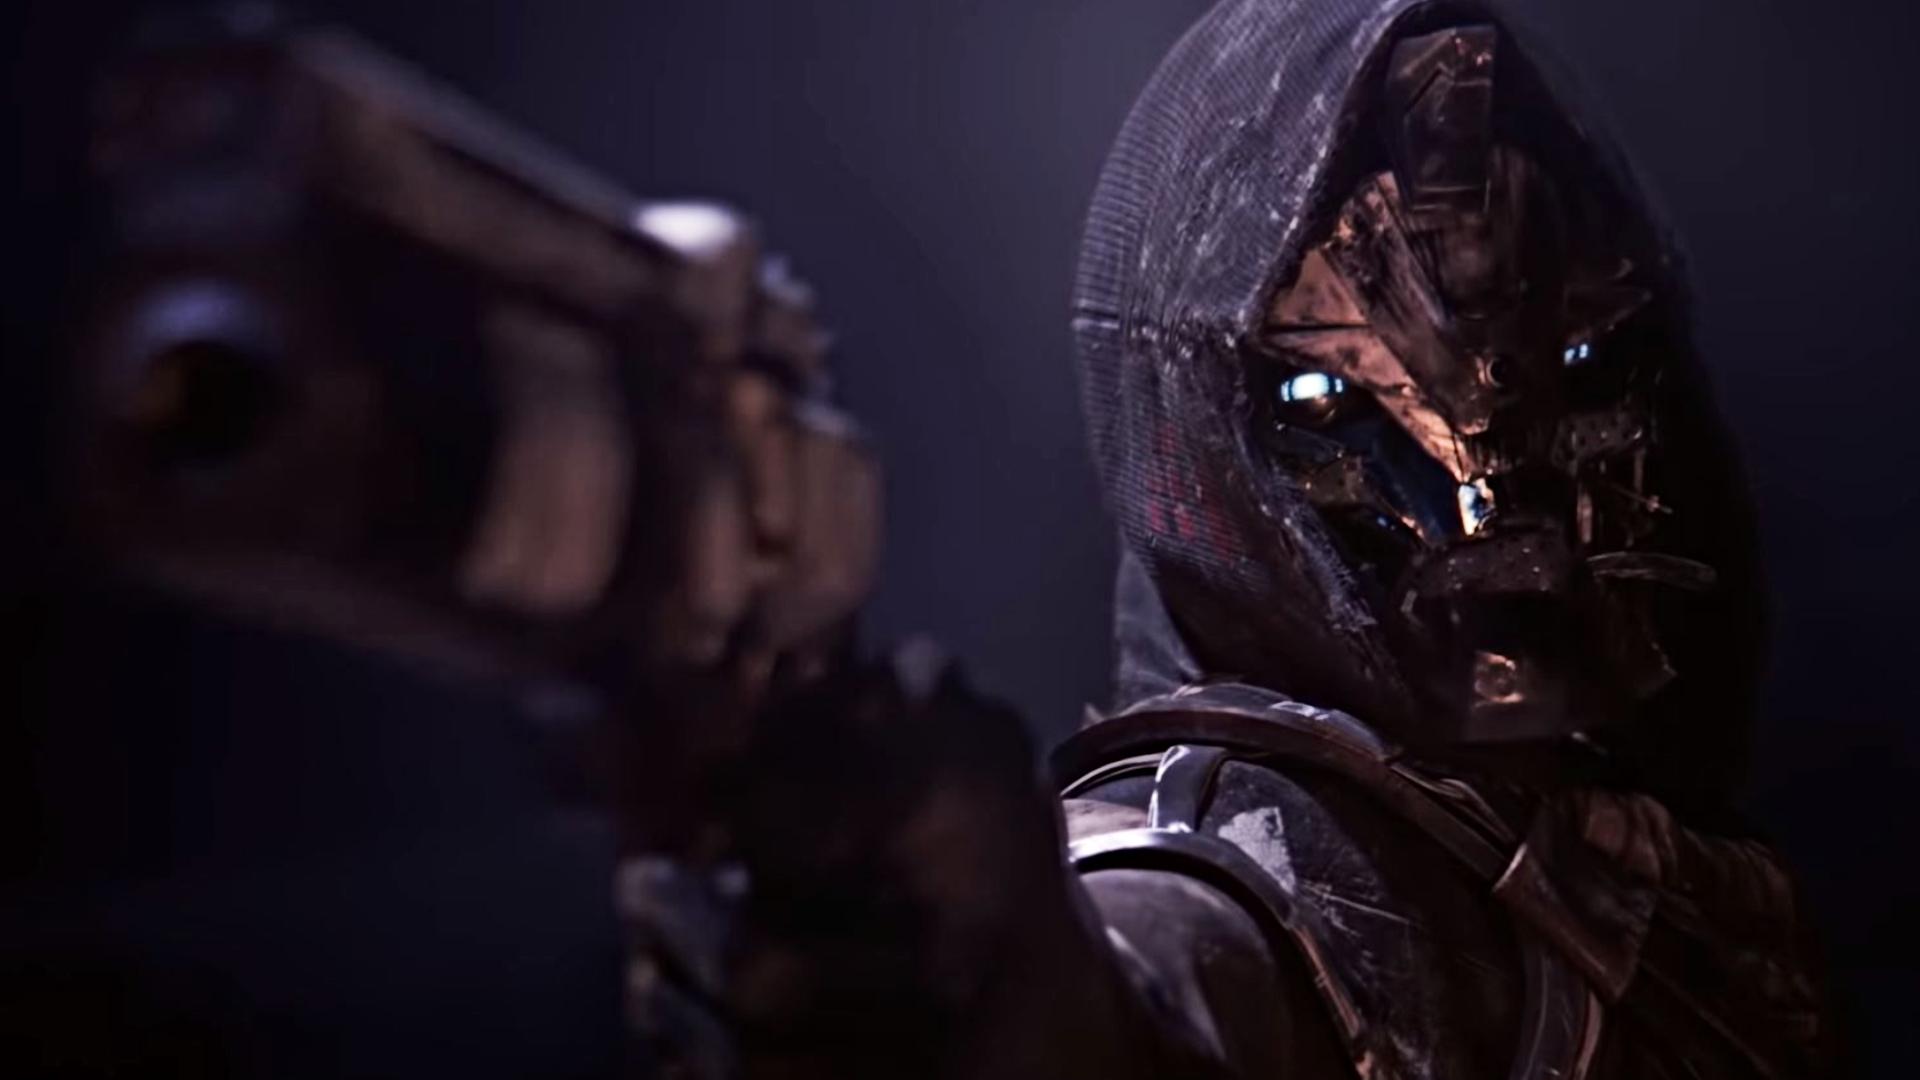 Destiny 2 Forsaken Wallpapers High Quality Download Free